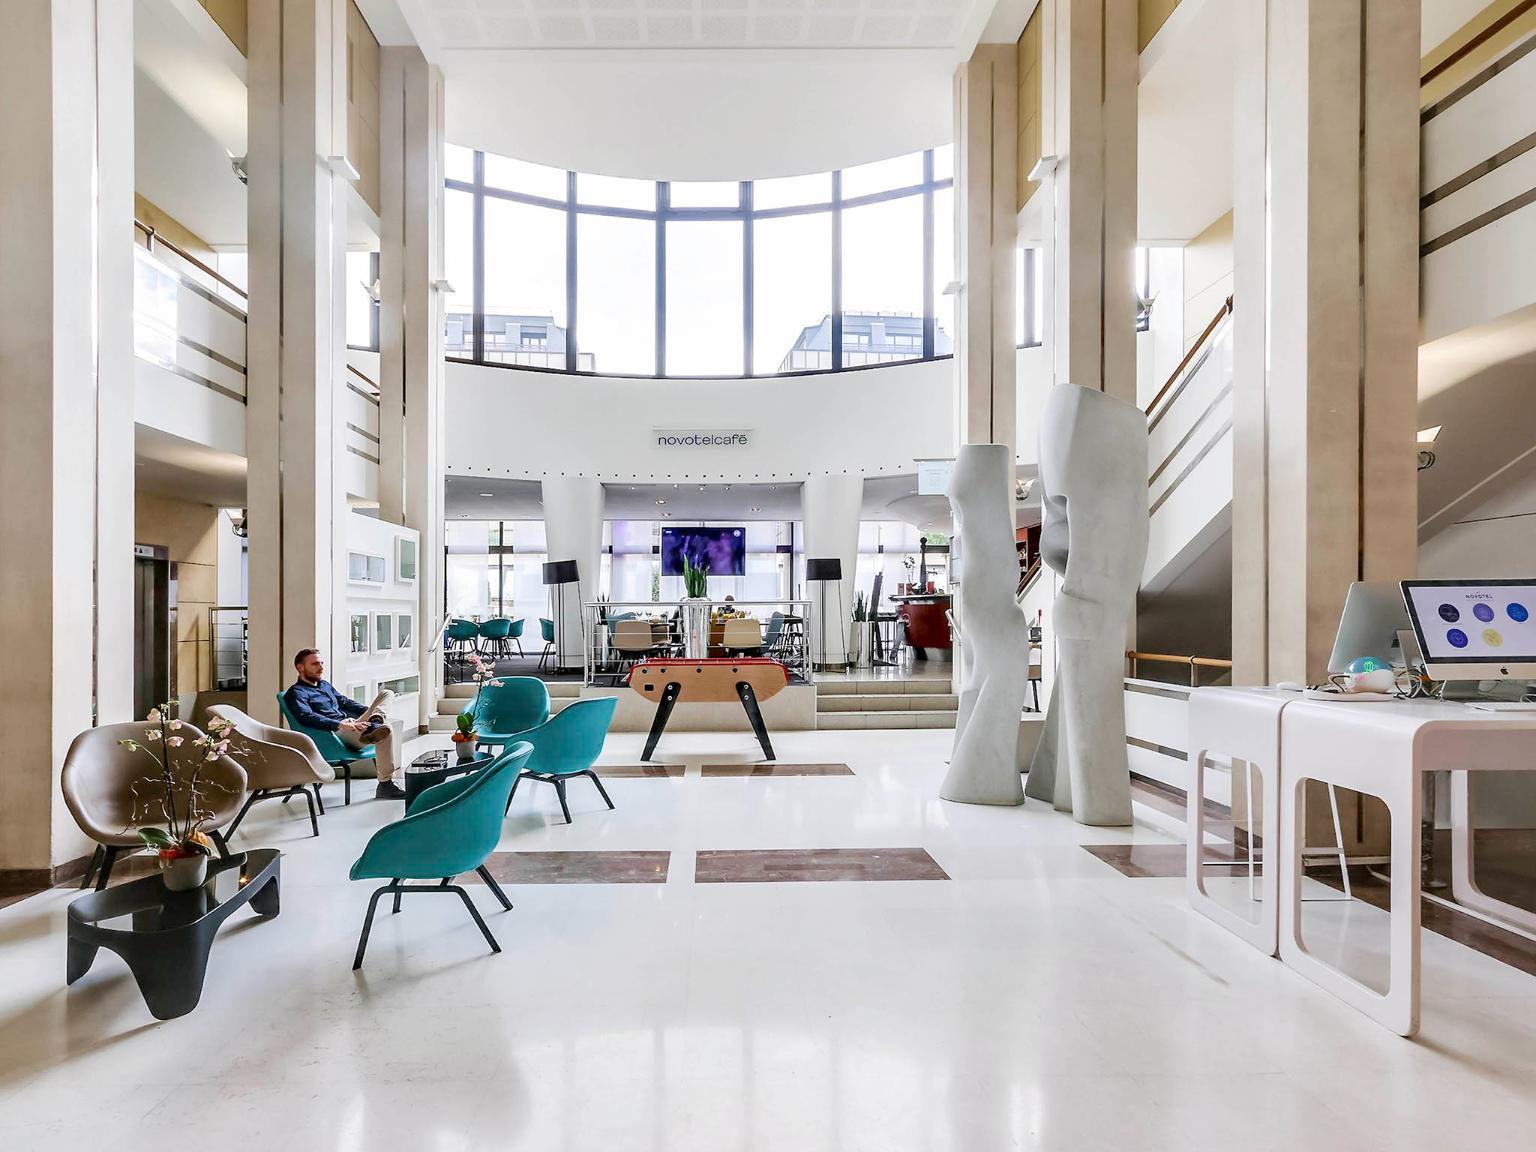 novotel paris vaugirard montparnasse h tel 257 rue de. Black Bedroom Furniture Sets. Home Design Ideas